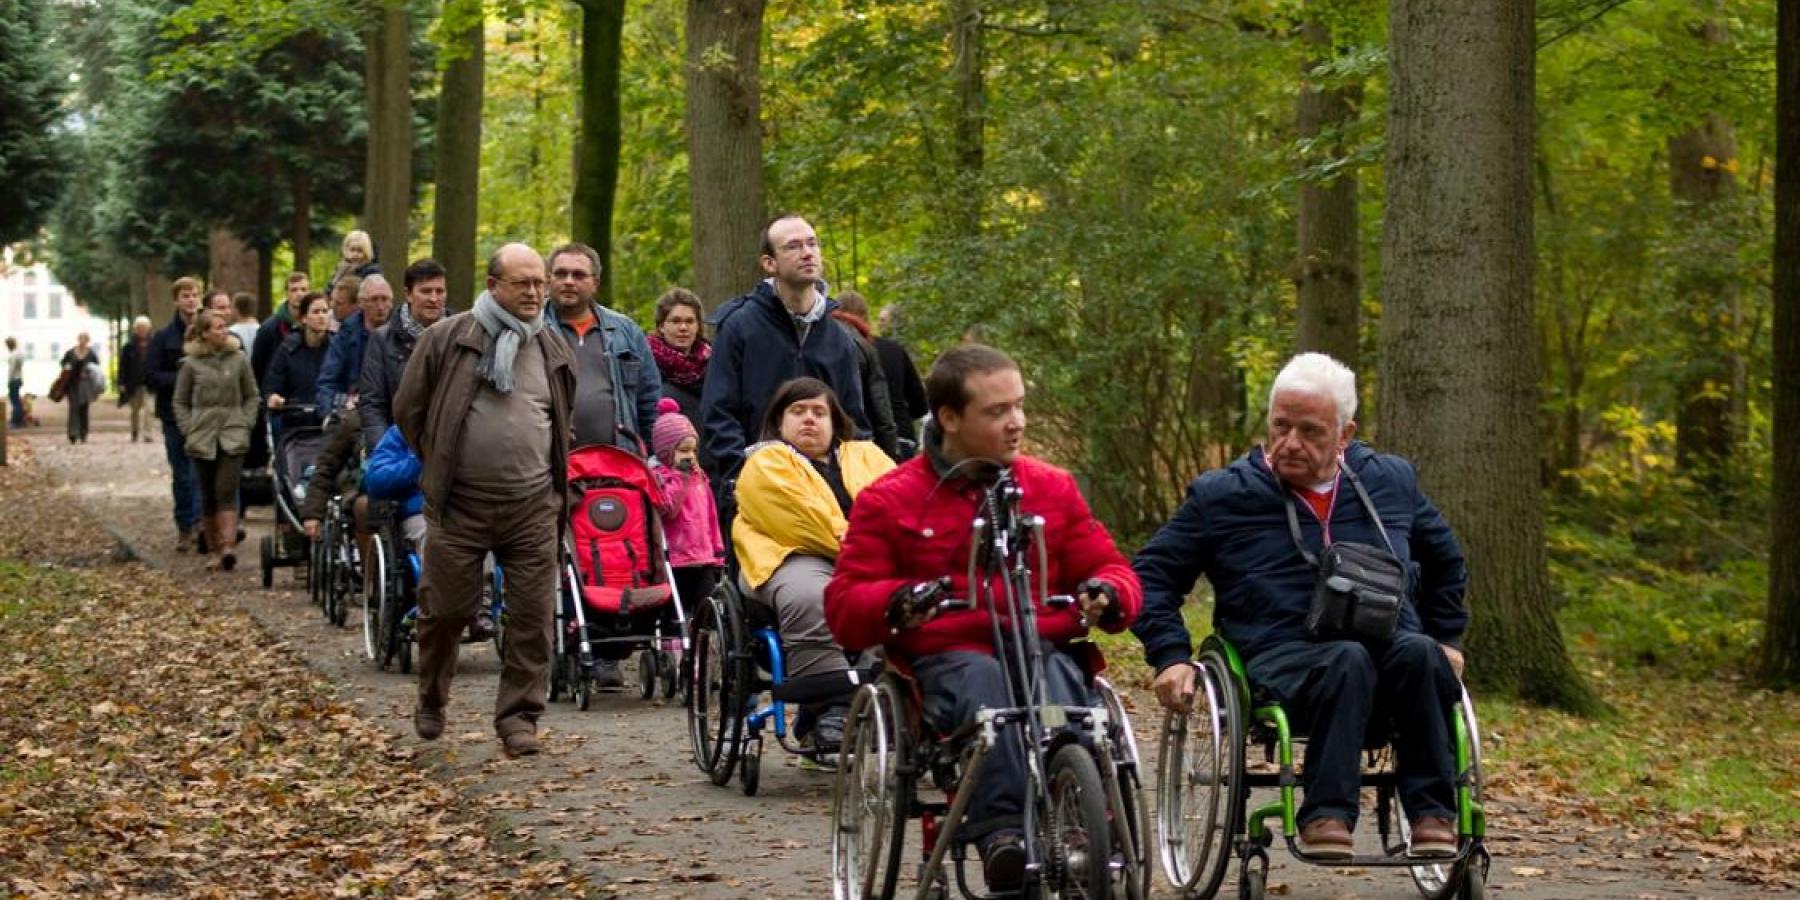 spina bifida resource network